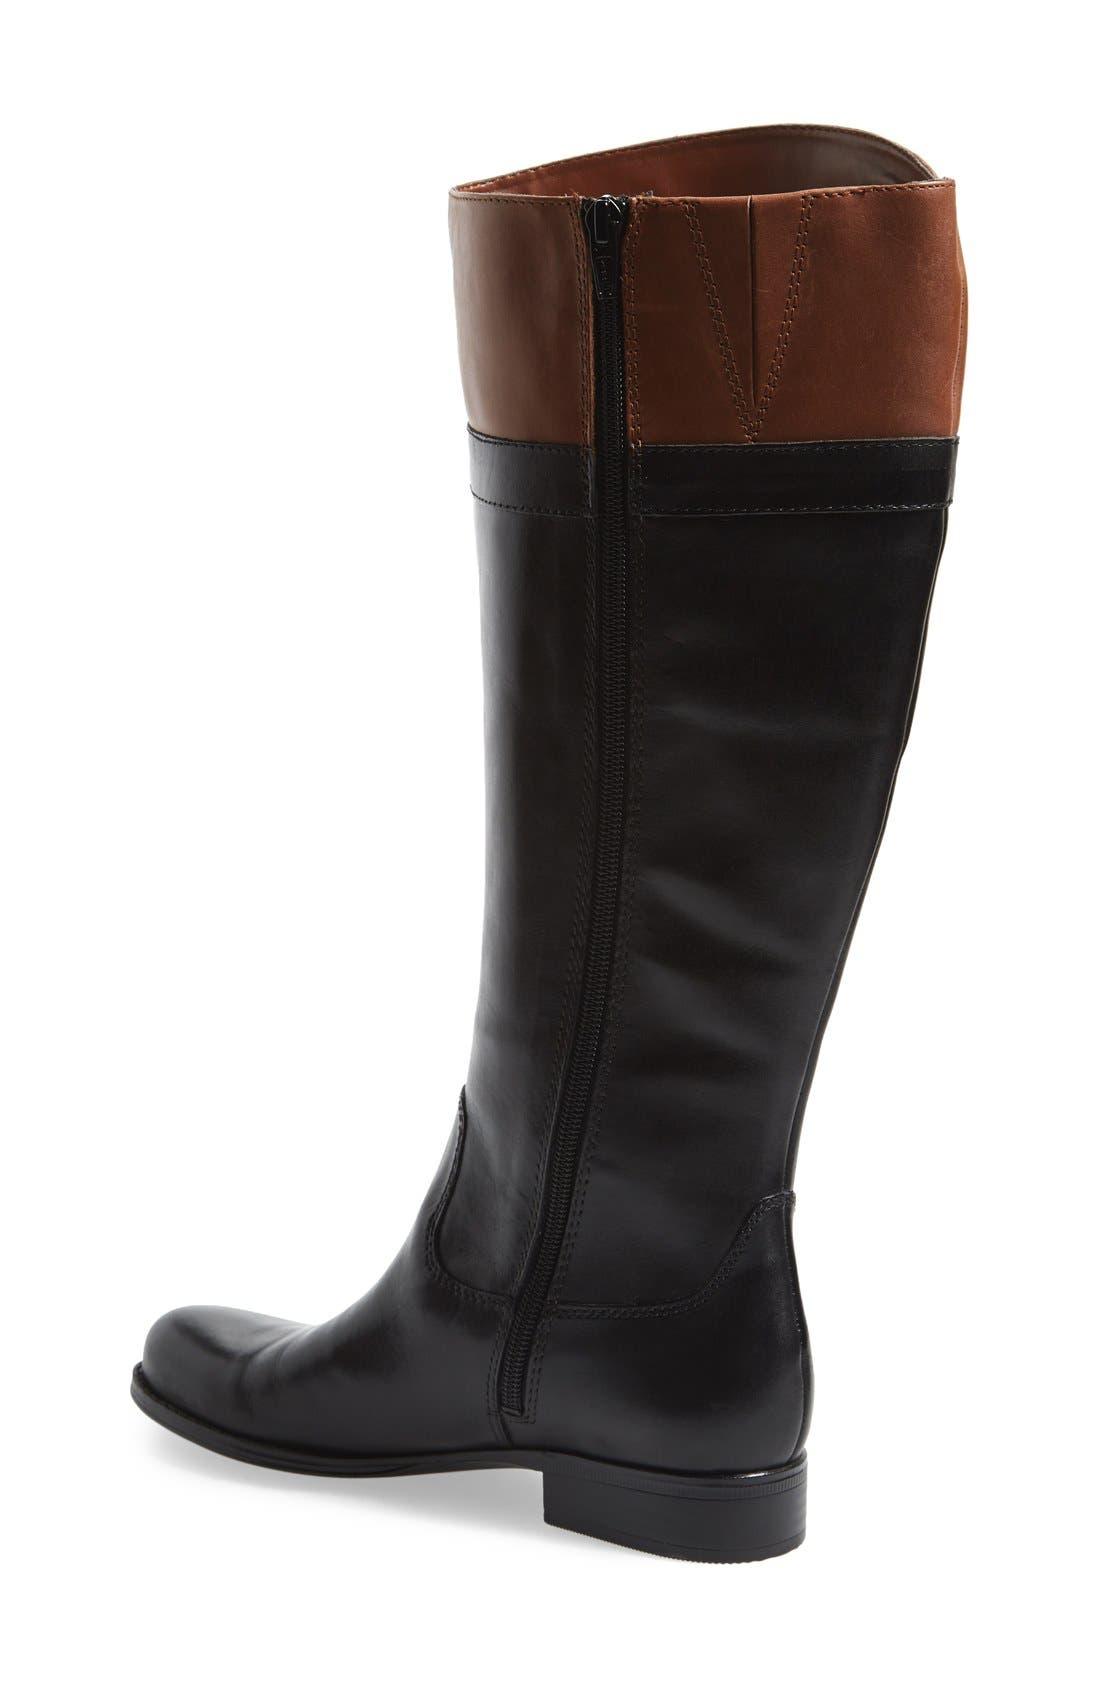 Alternate Image 2  - Naturalizer 'Josette' Knee High Boot (Wide Calf) (Women)